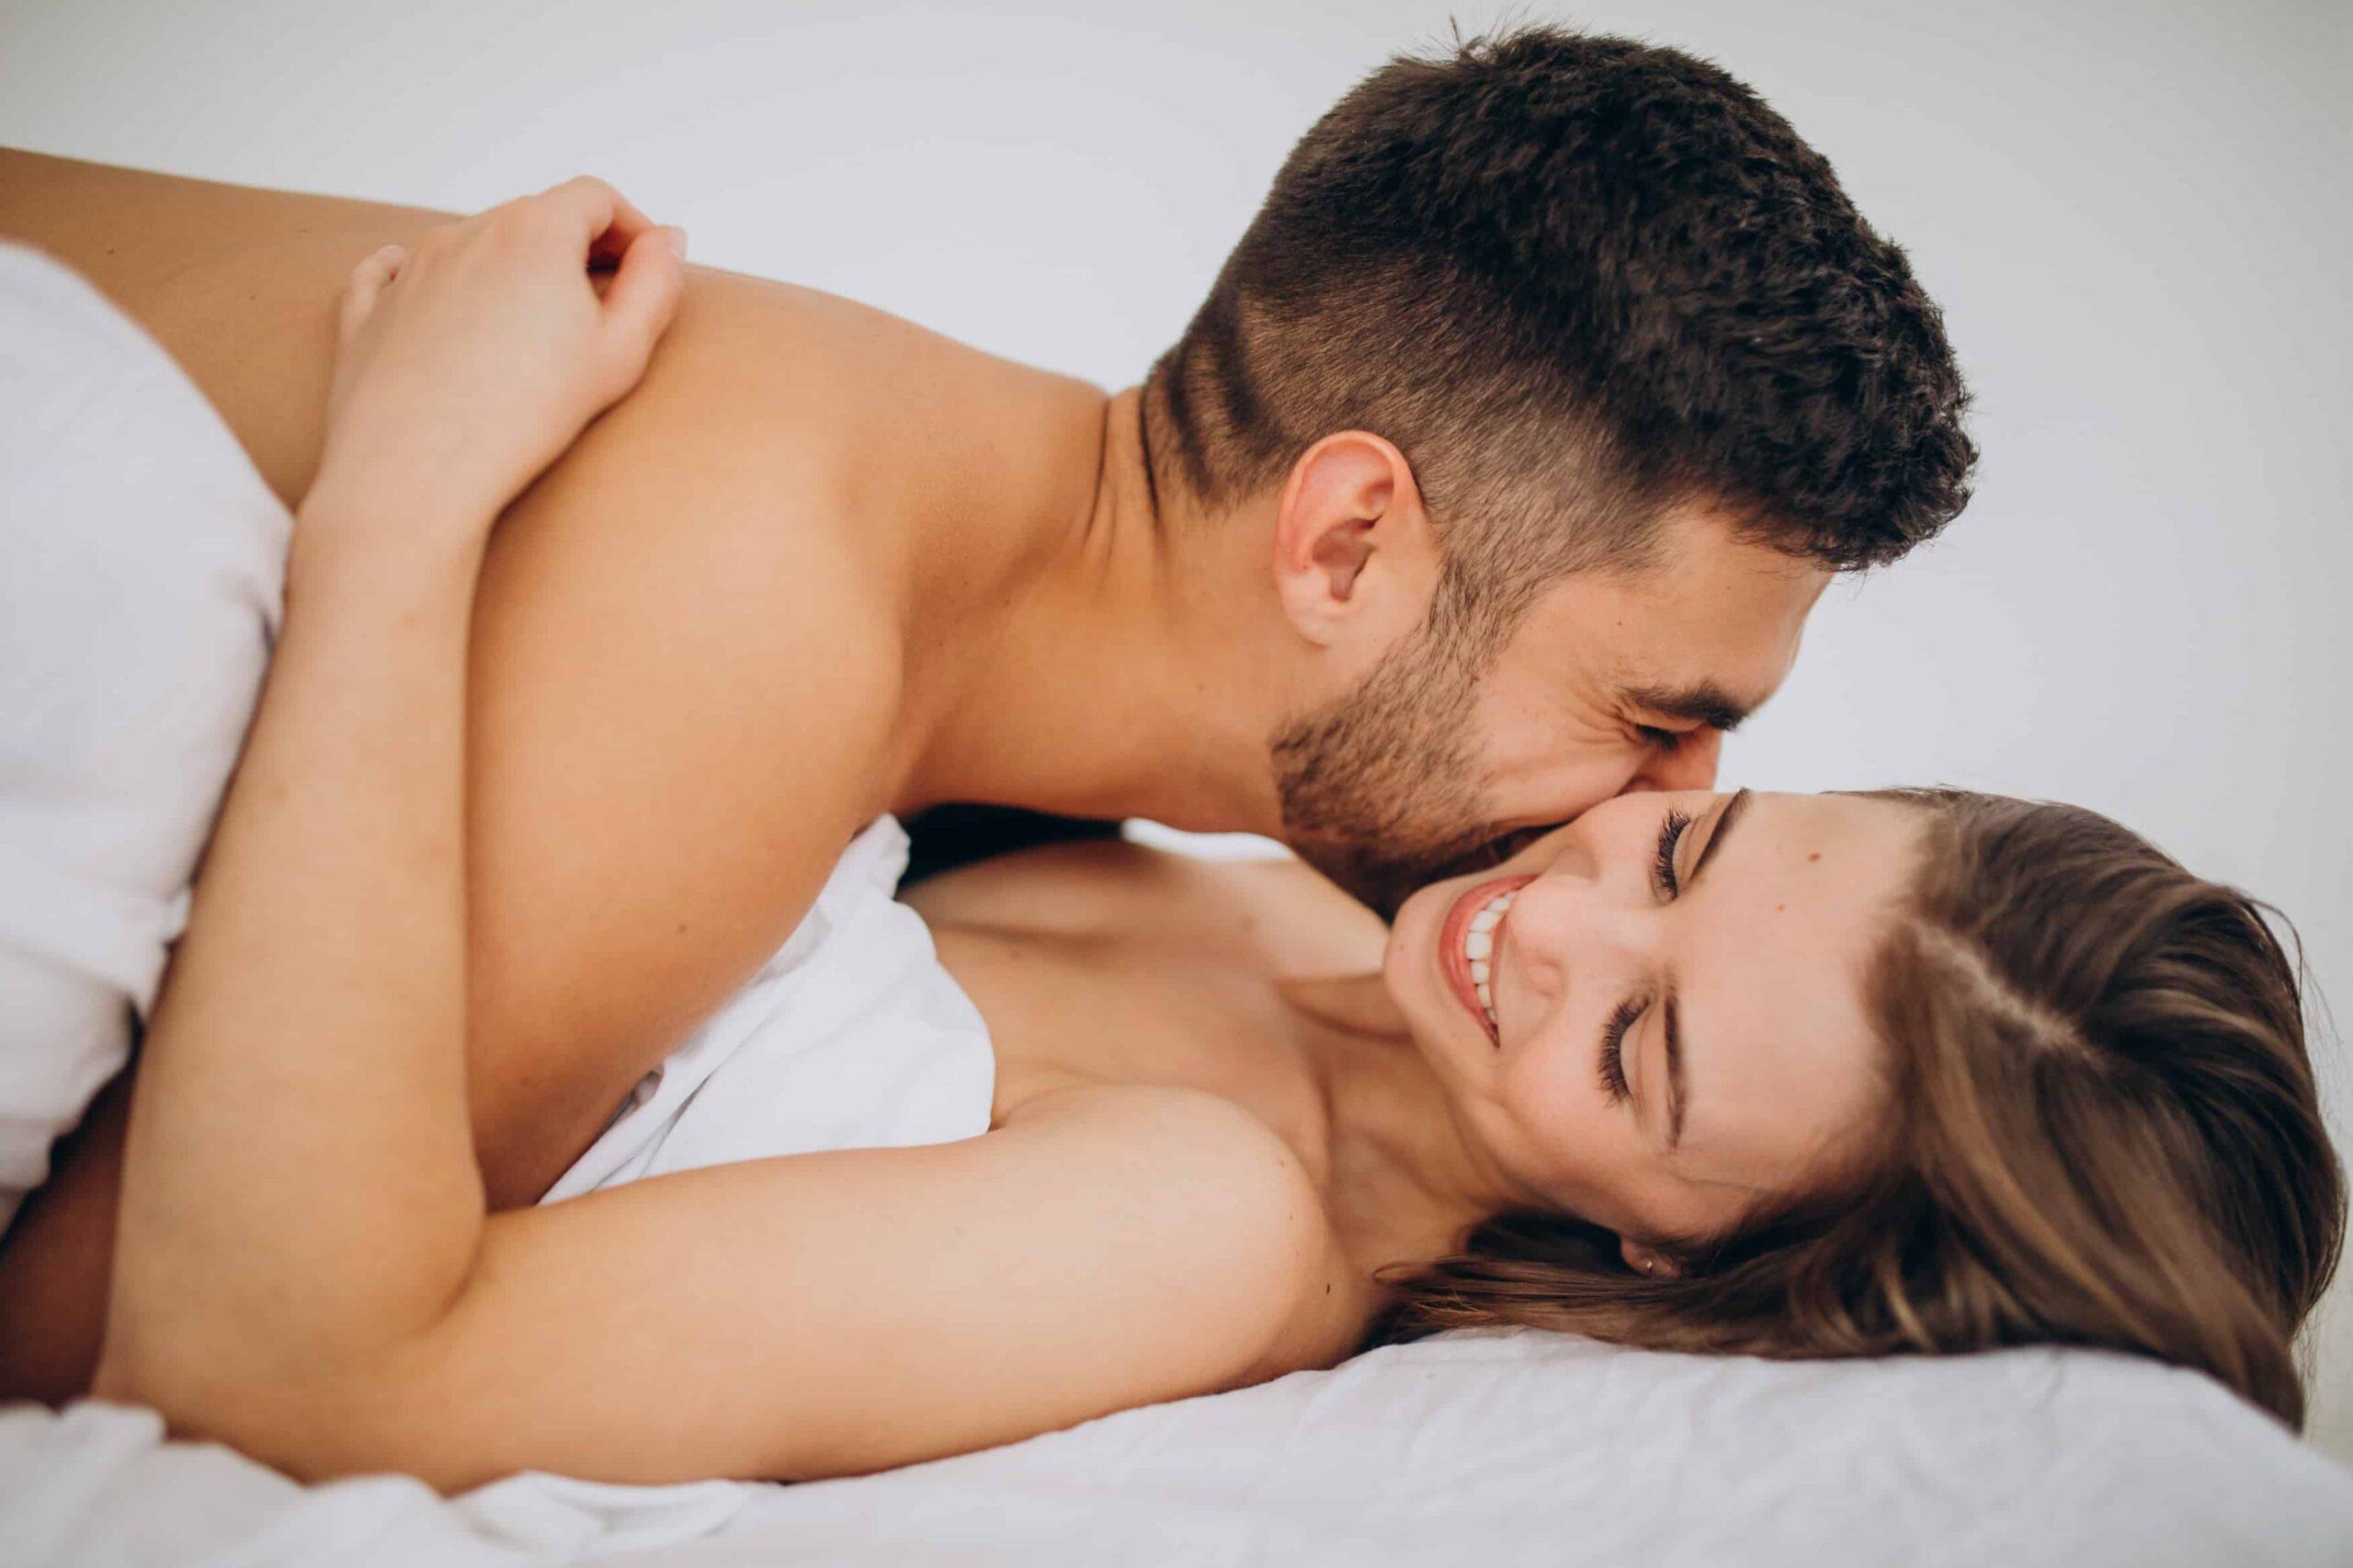 sex mistakes